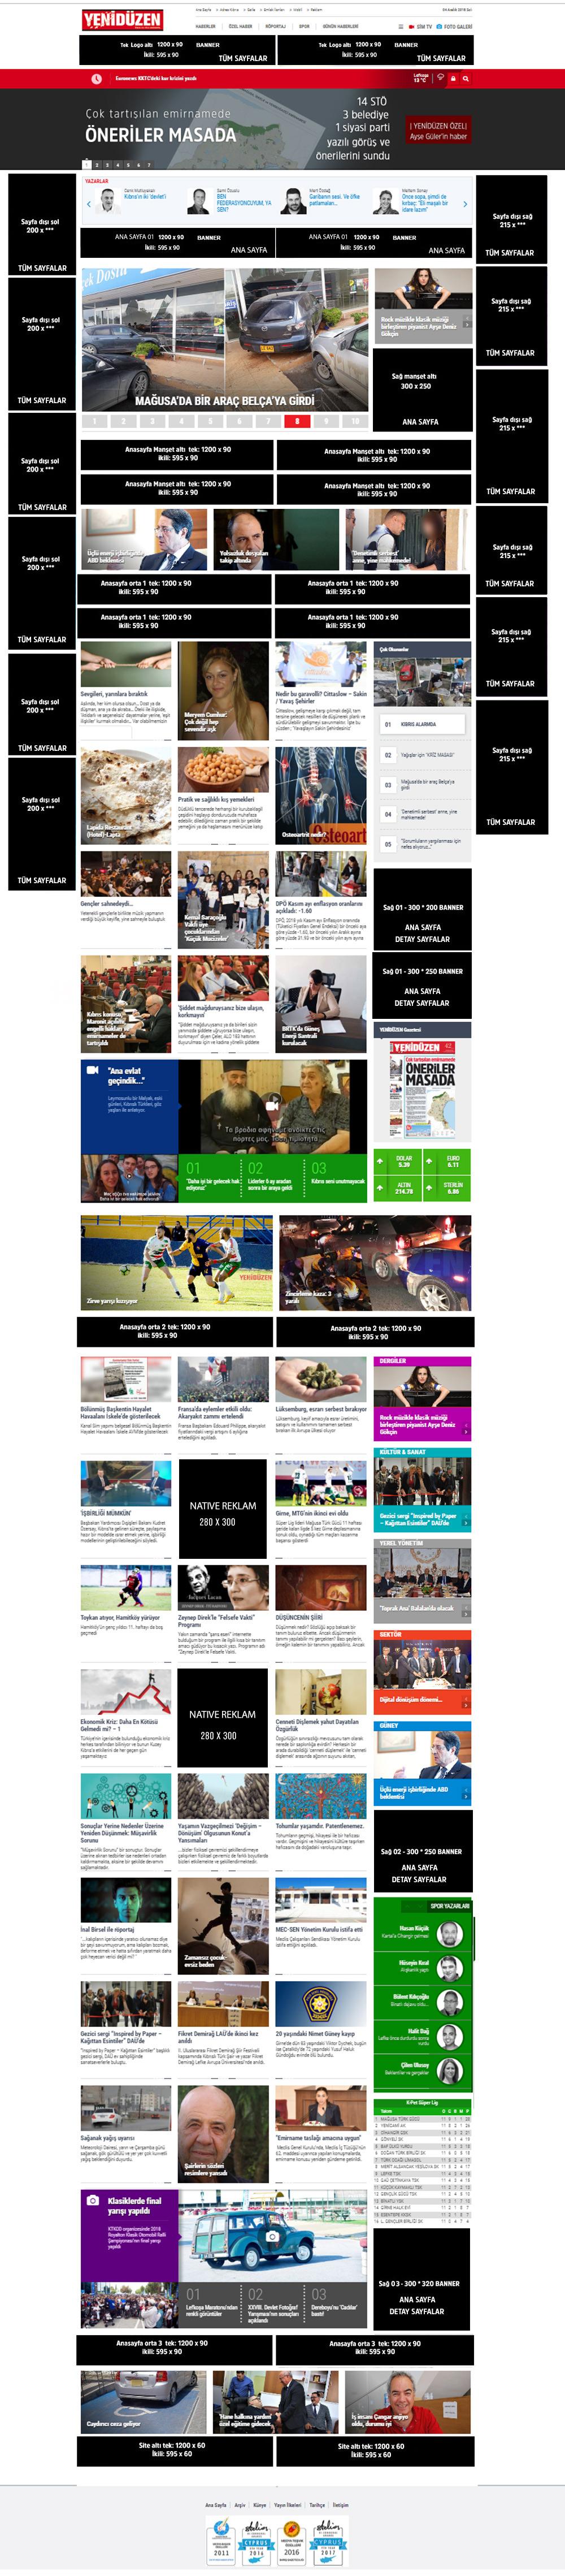 yd-ana-sayfa-reklam-alani-001.jpg